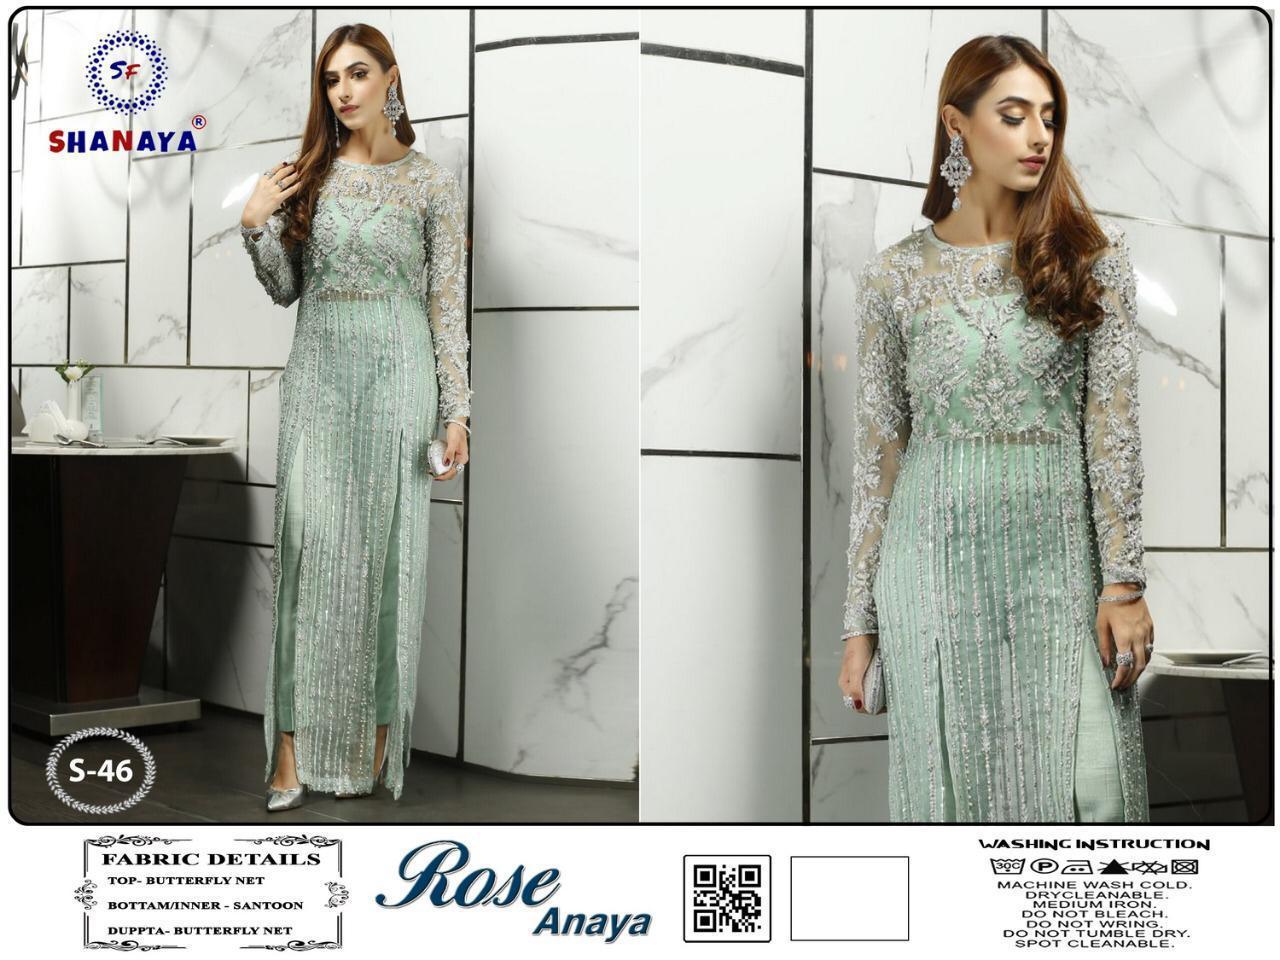 Shanaya Rose Anaya S 46 Heavy Butterfly Net With Heavy Embroidery Work Pakistani Pattern Suits In Singles